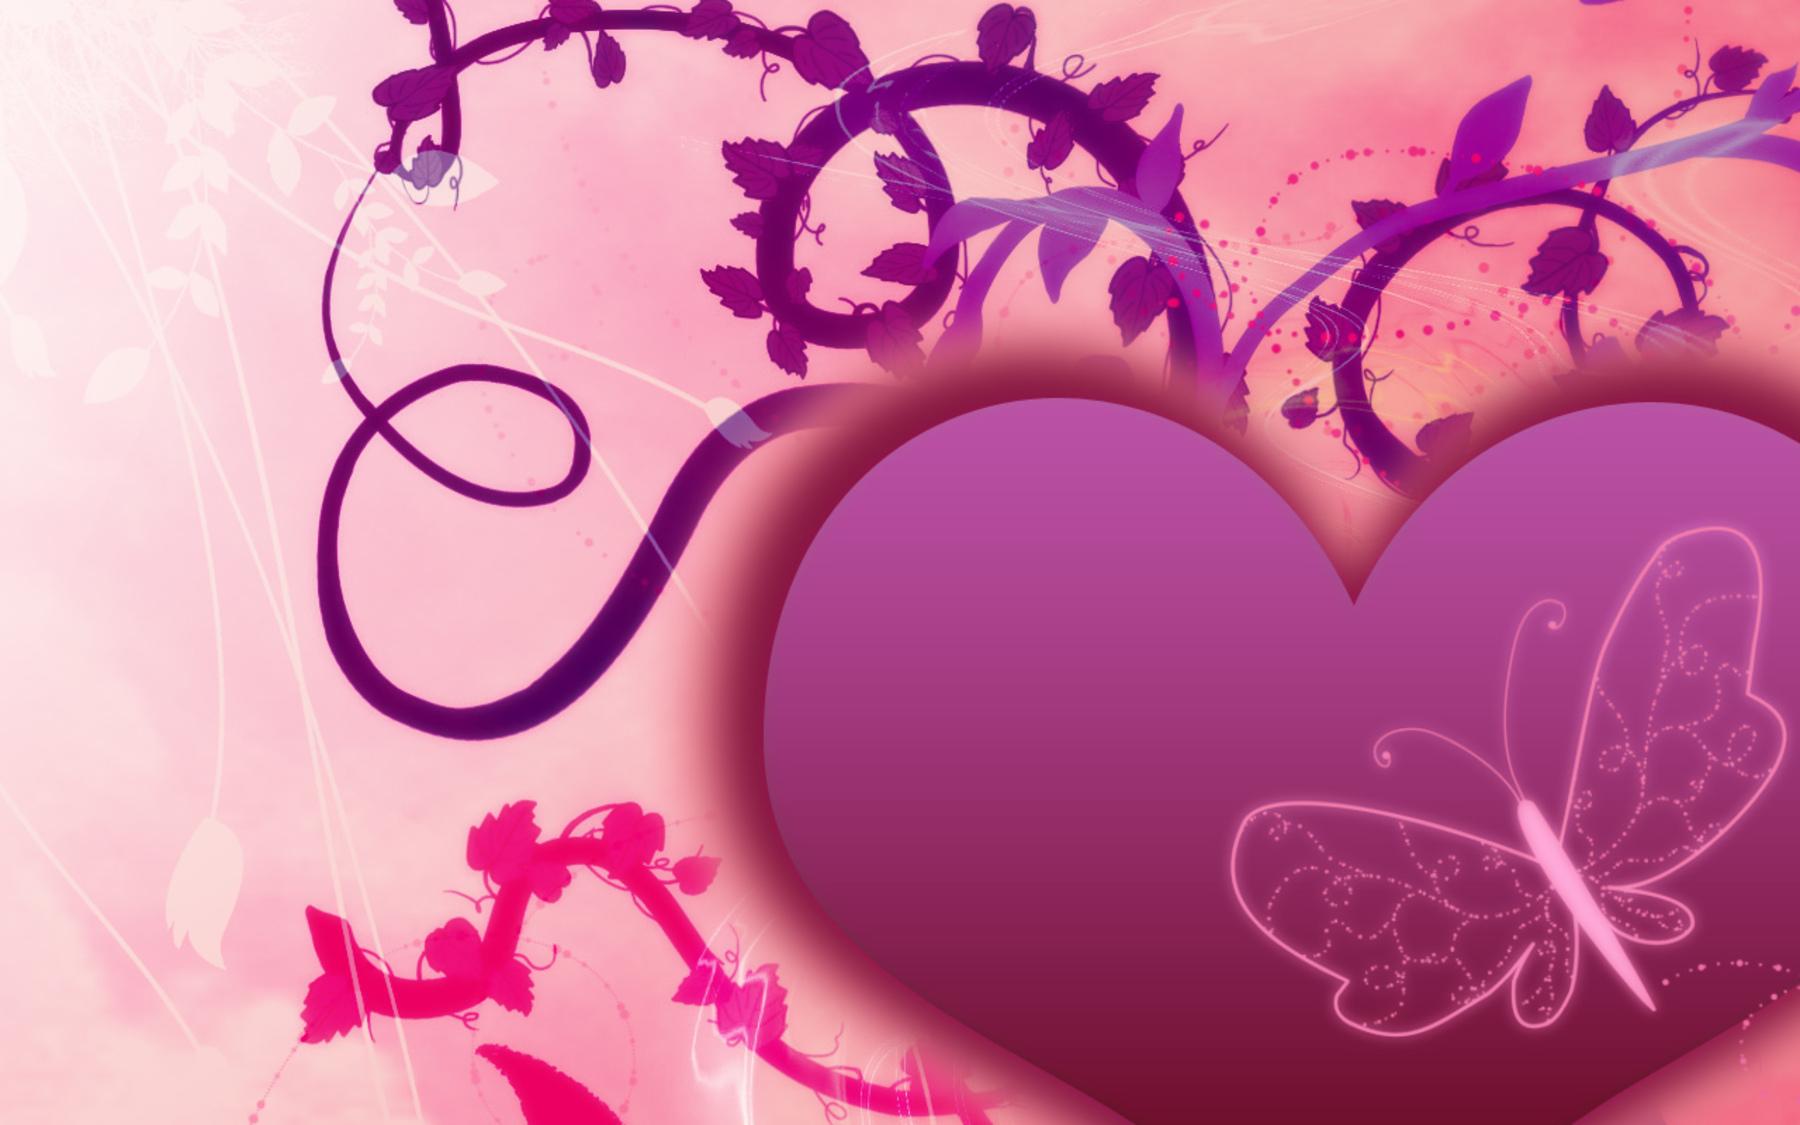 Heart In Love Wallpaper Hd: Love Wallpapers Hd, Amor Fondos De Pantalla, Love 3D